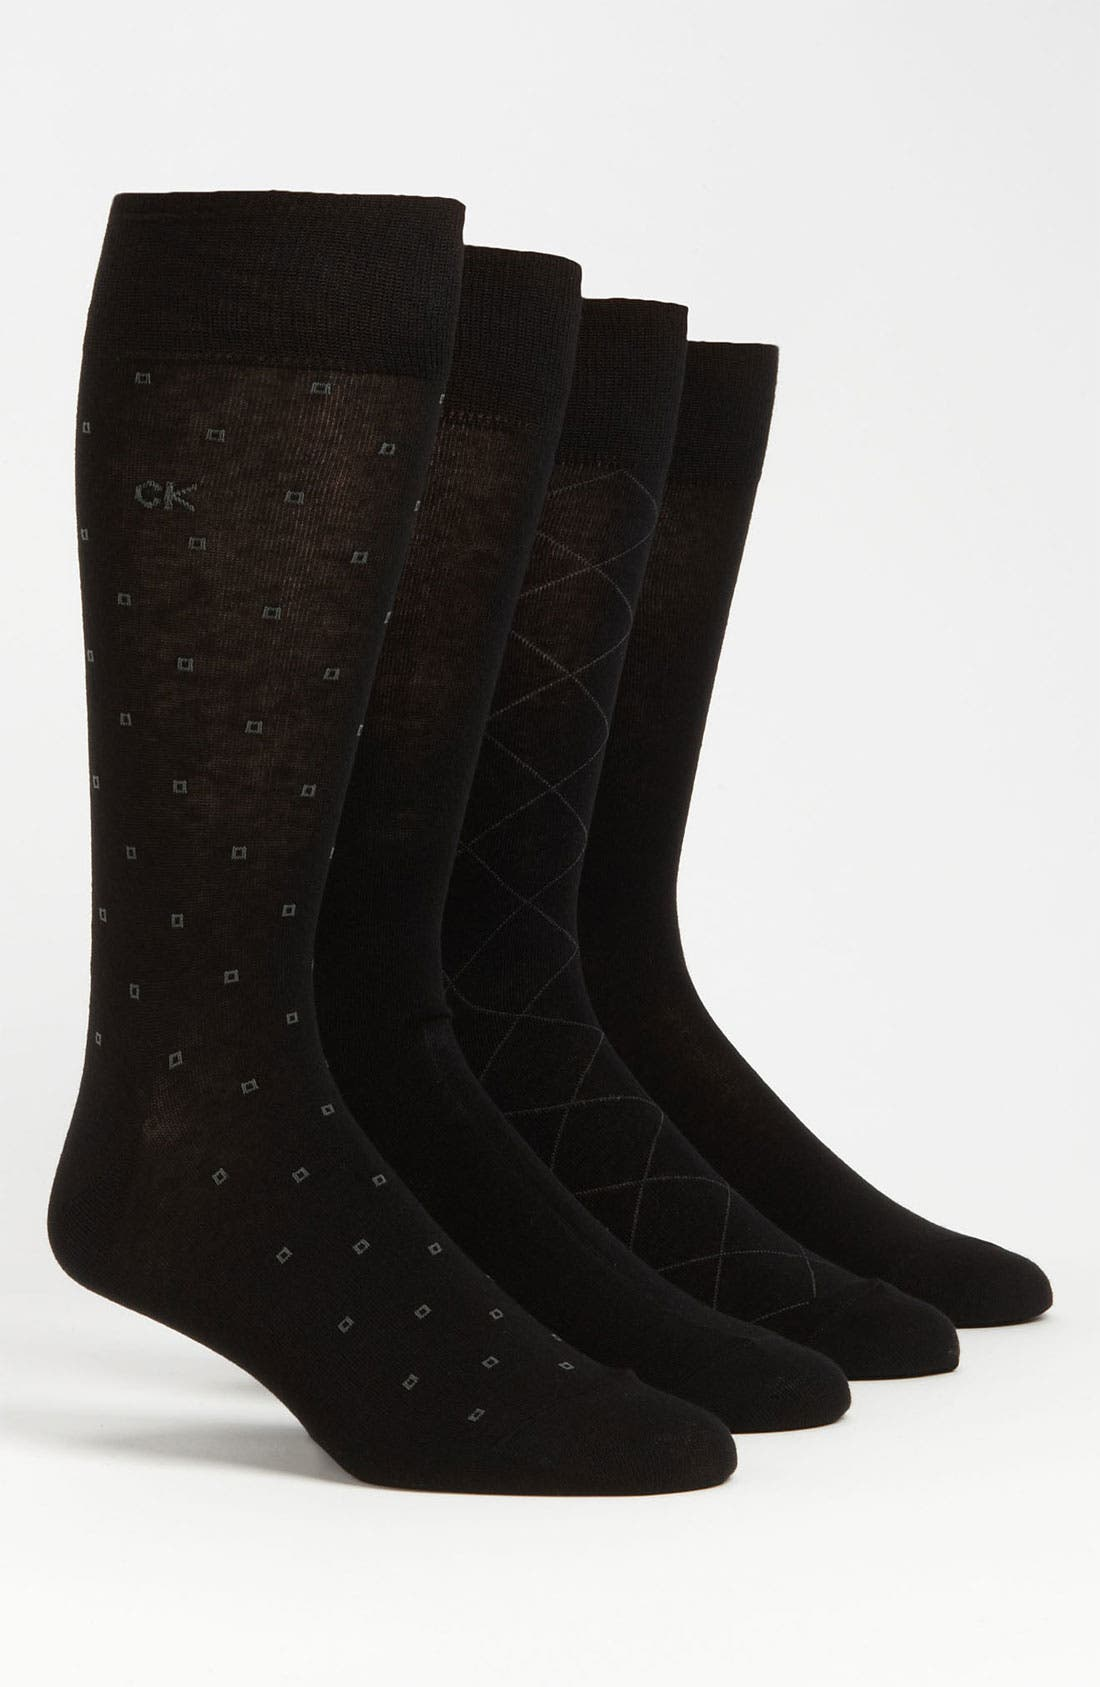 Alternate Image 1 Selected - Calvin Klein Patterned Socks (4-Pack)